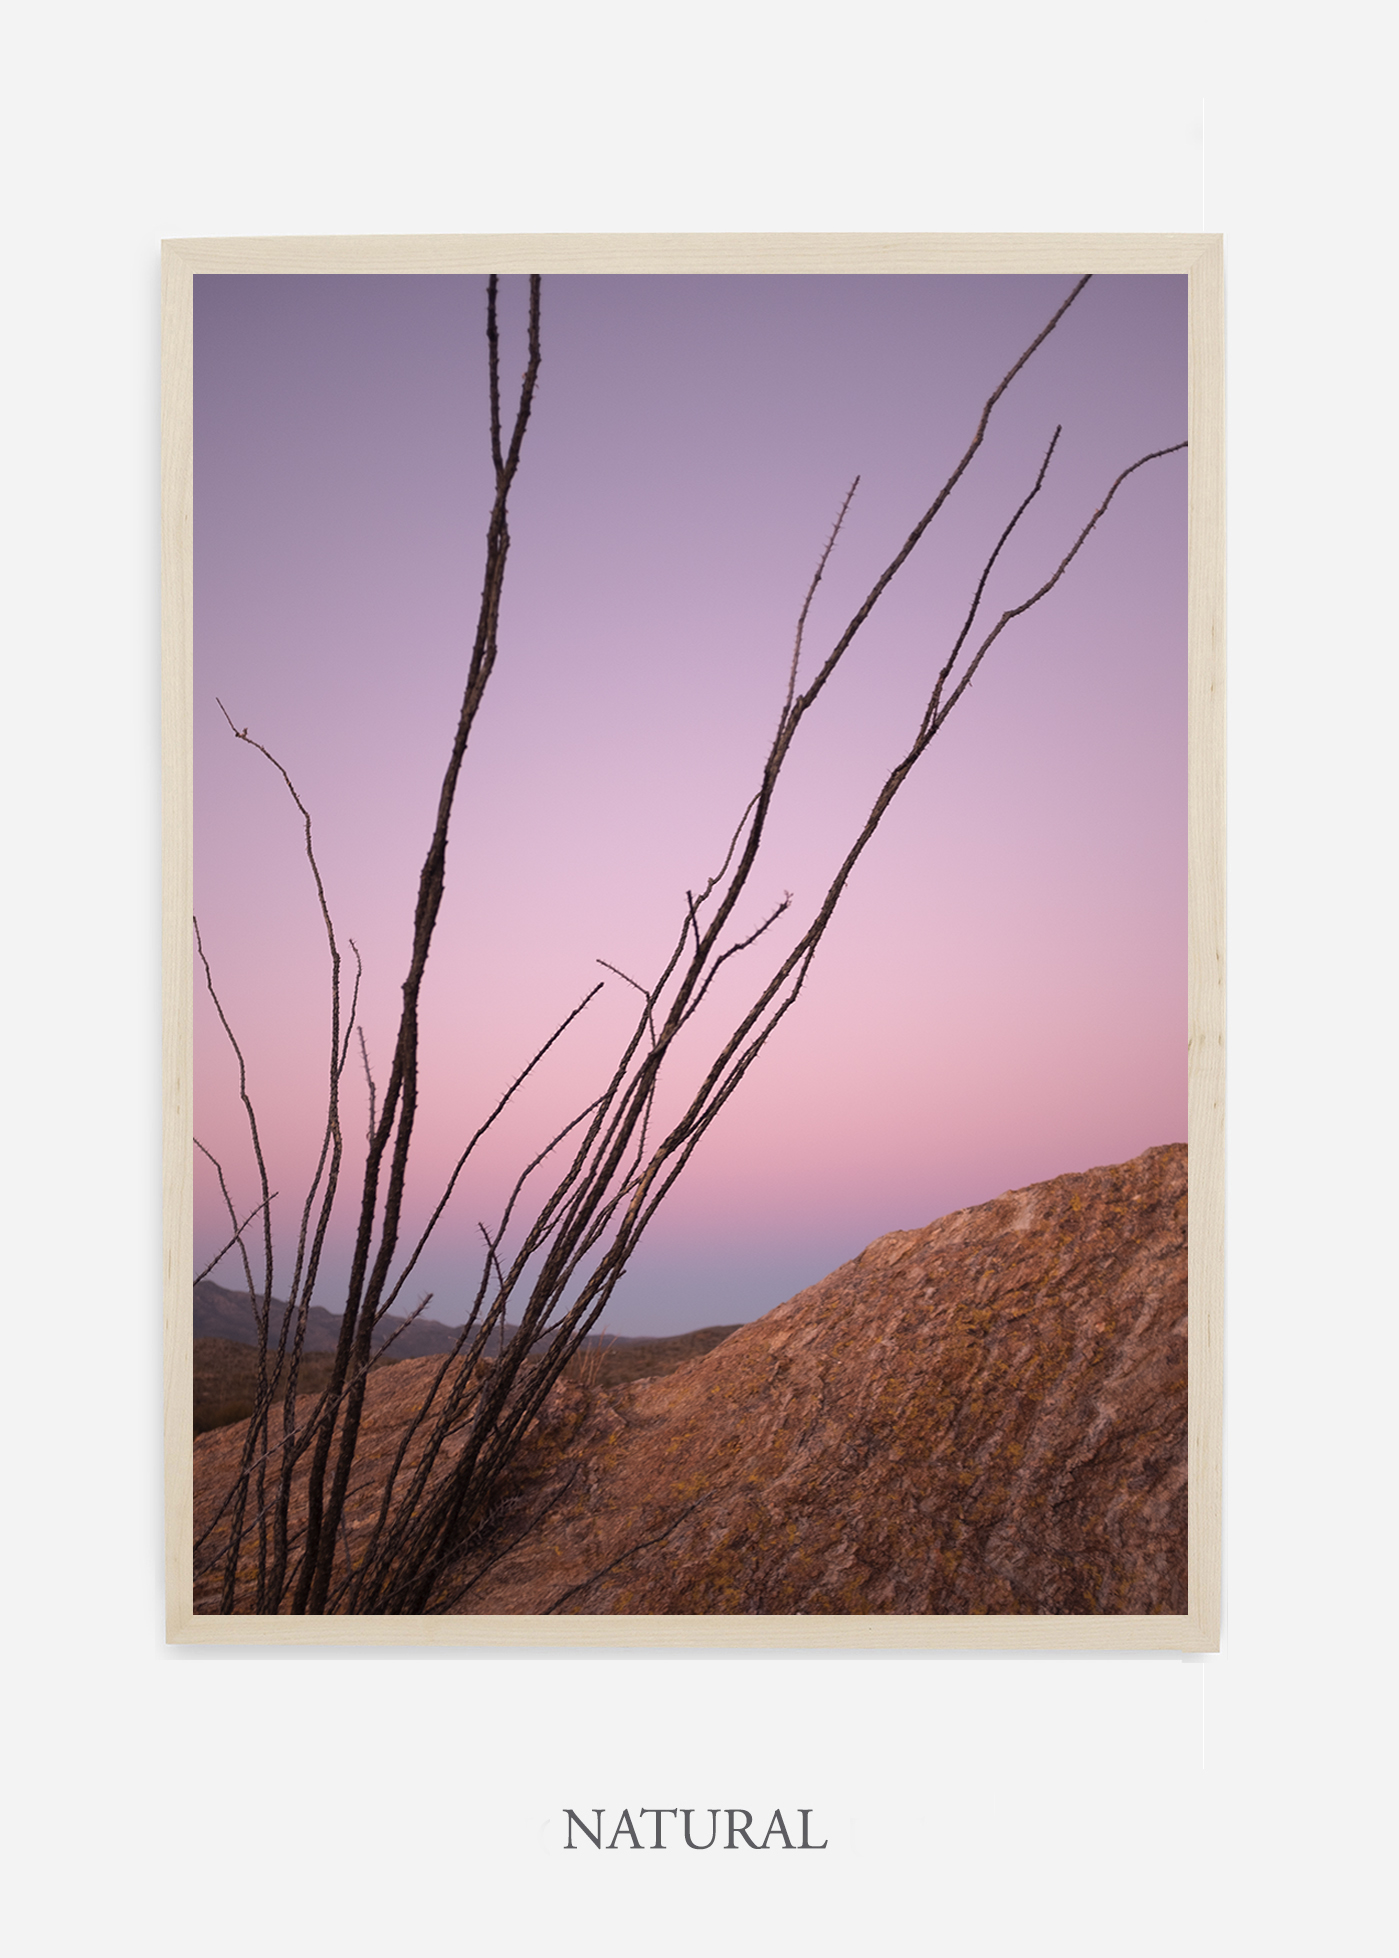 nomat-naturalframe-saguaroNo.12-wildercalifornia-art-wallart-cactusprint-homedecor-prints-arizona-botanical-artwork-interiordesign.jpg